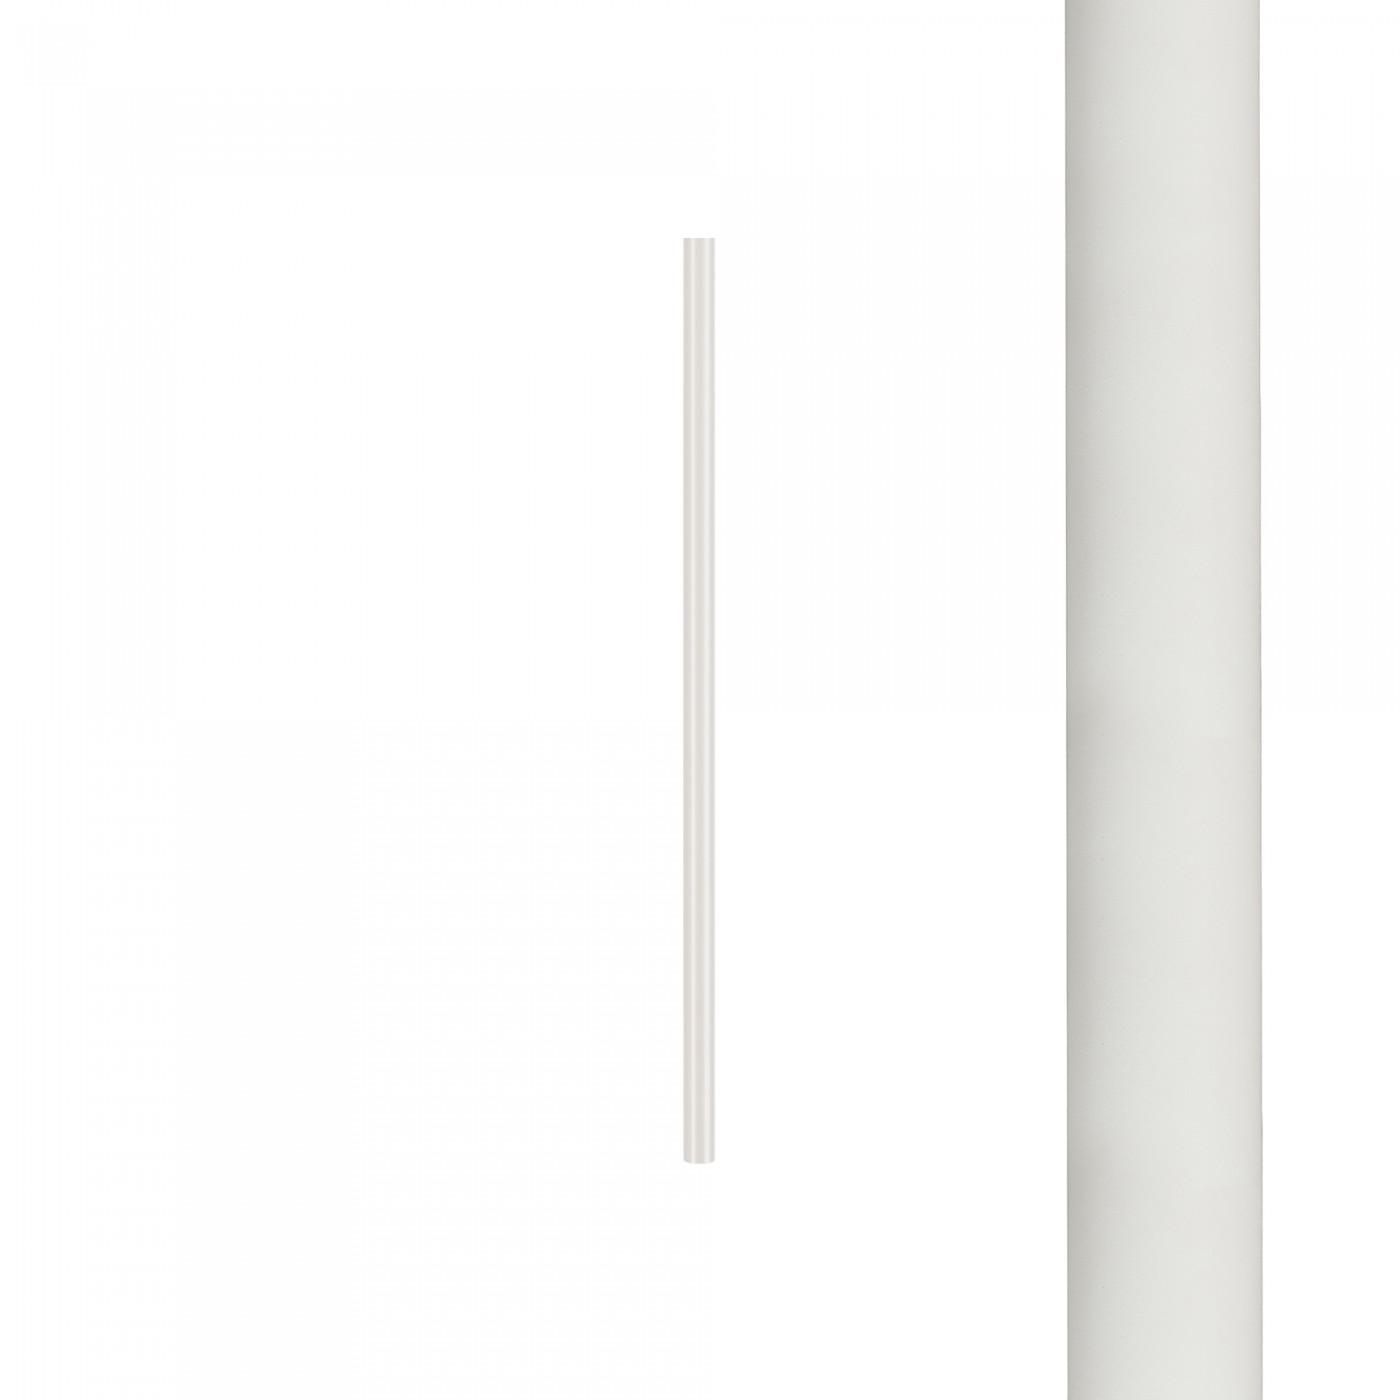 CAMELEON LASER 750 WH 8570 Nowodvorski Lighting